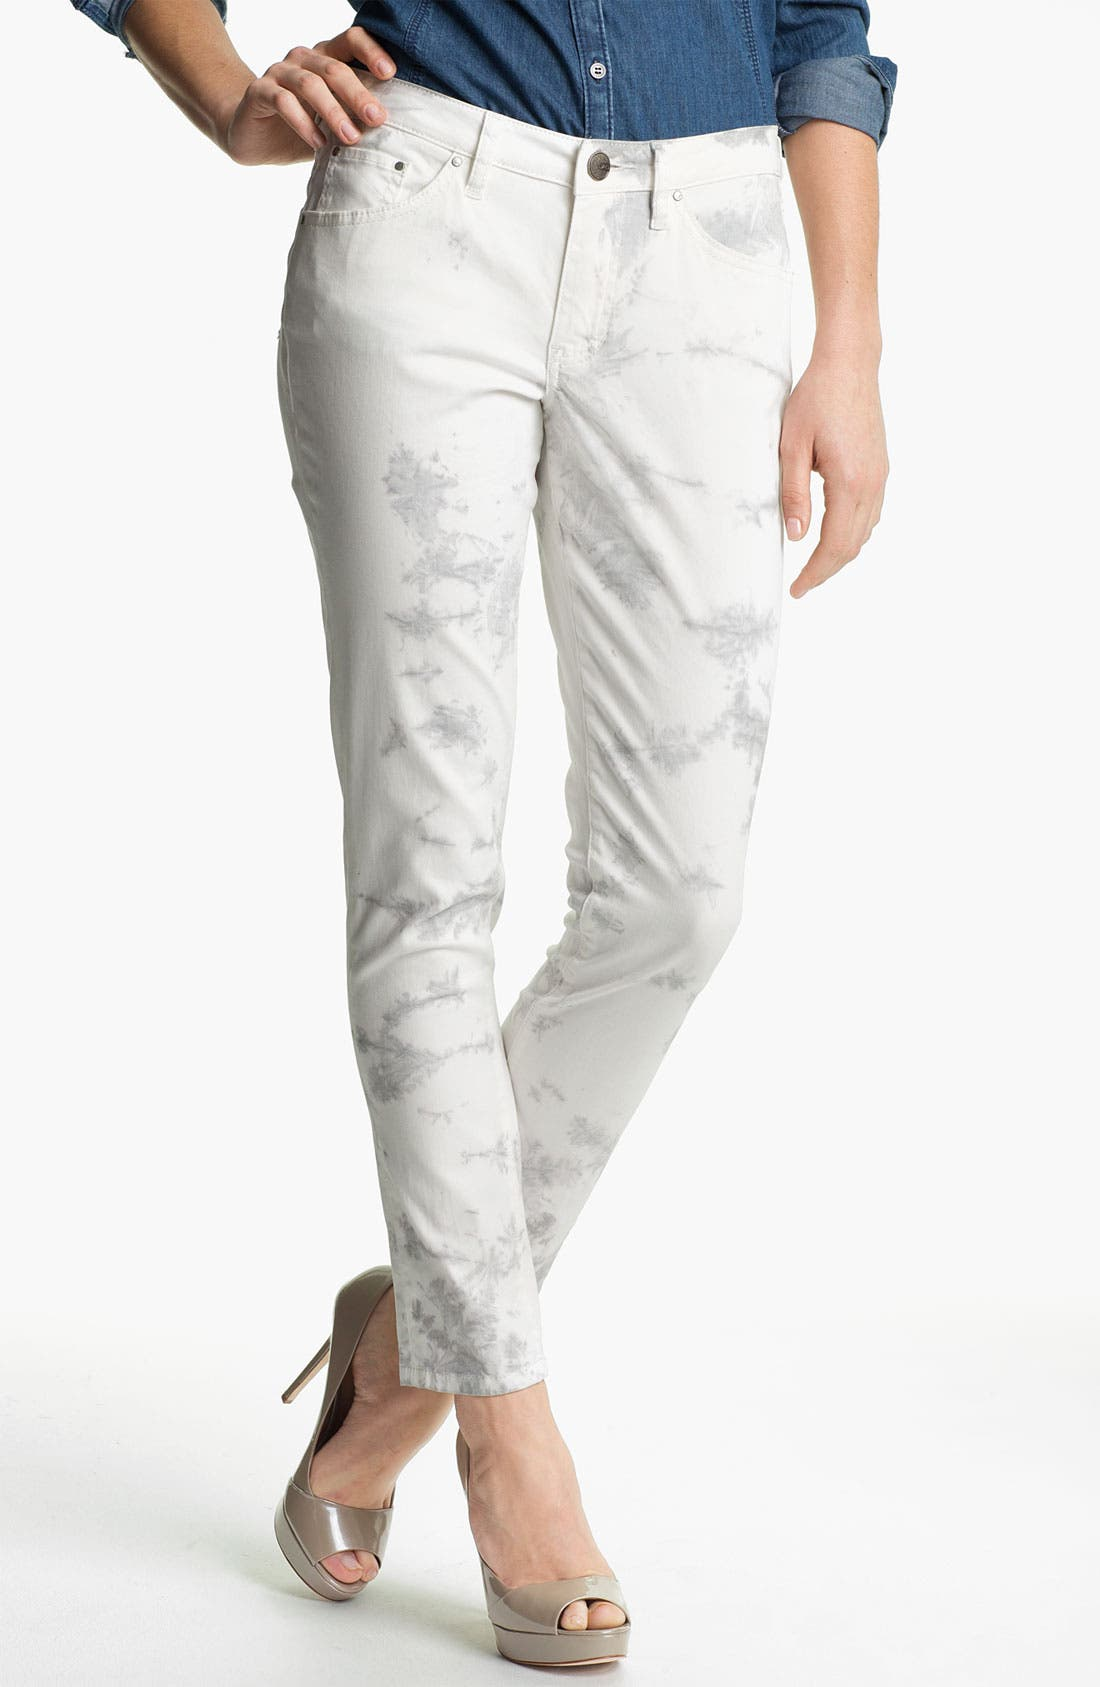 Main Image - Jag Jeans 'Chloe - Tie Dye' Skinny Jeans